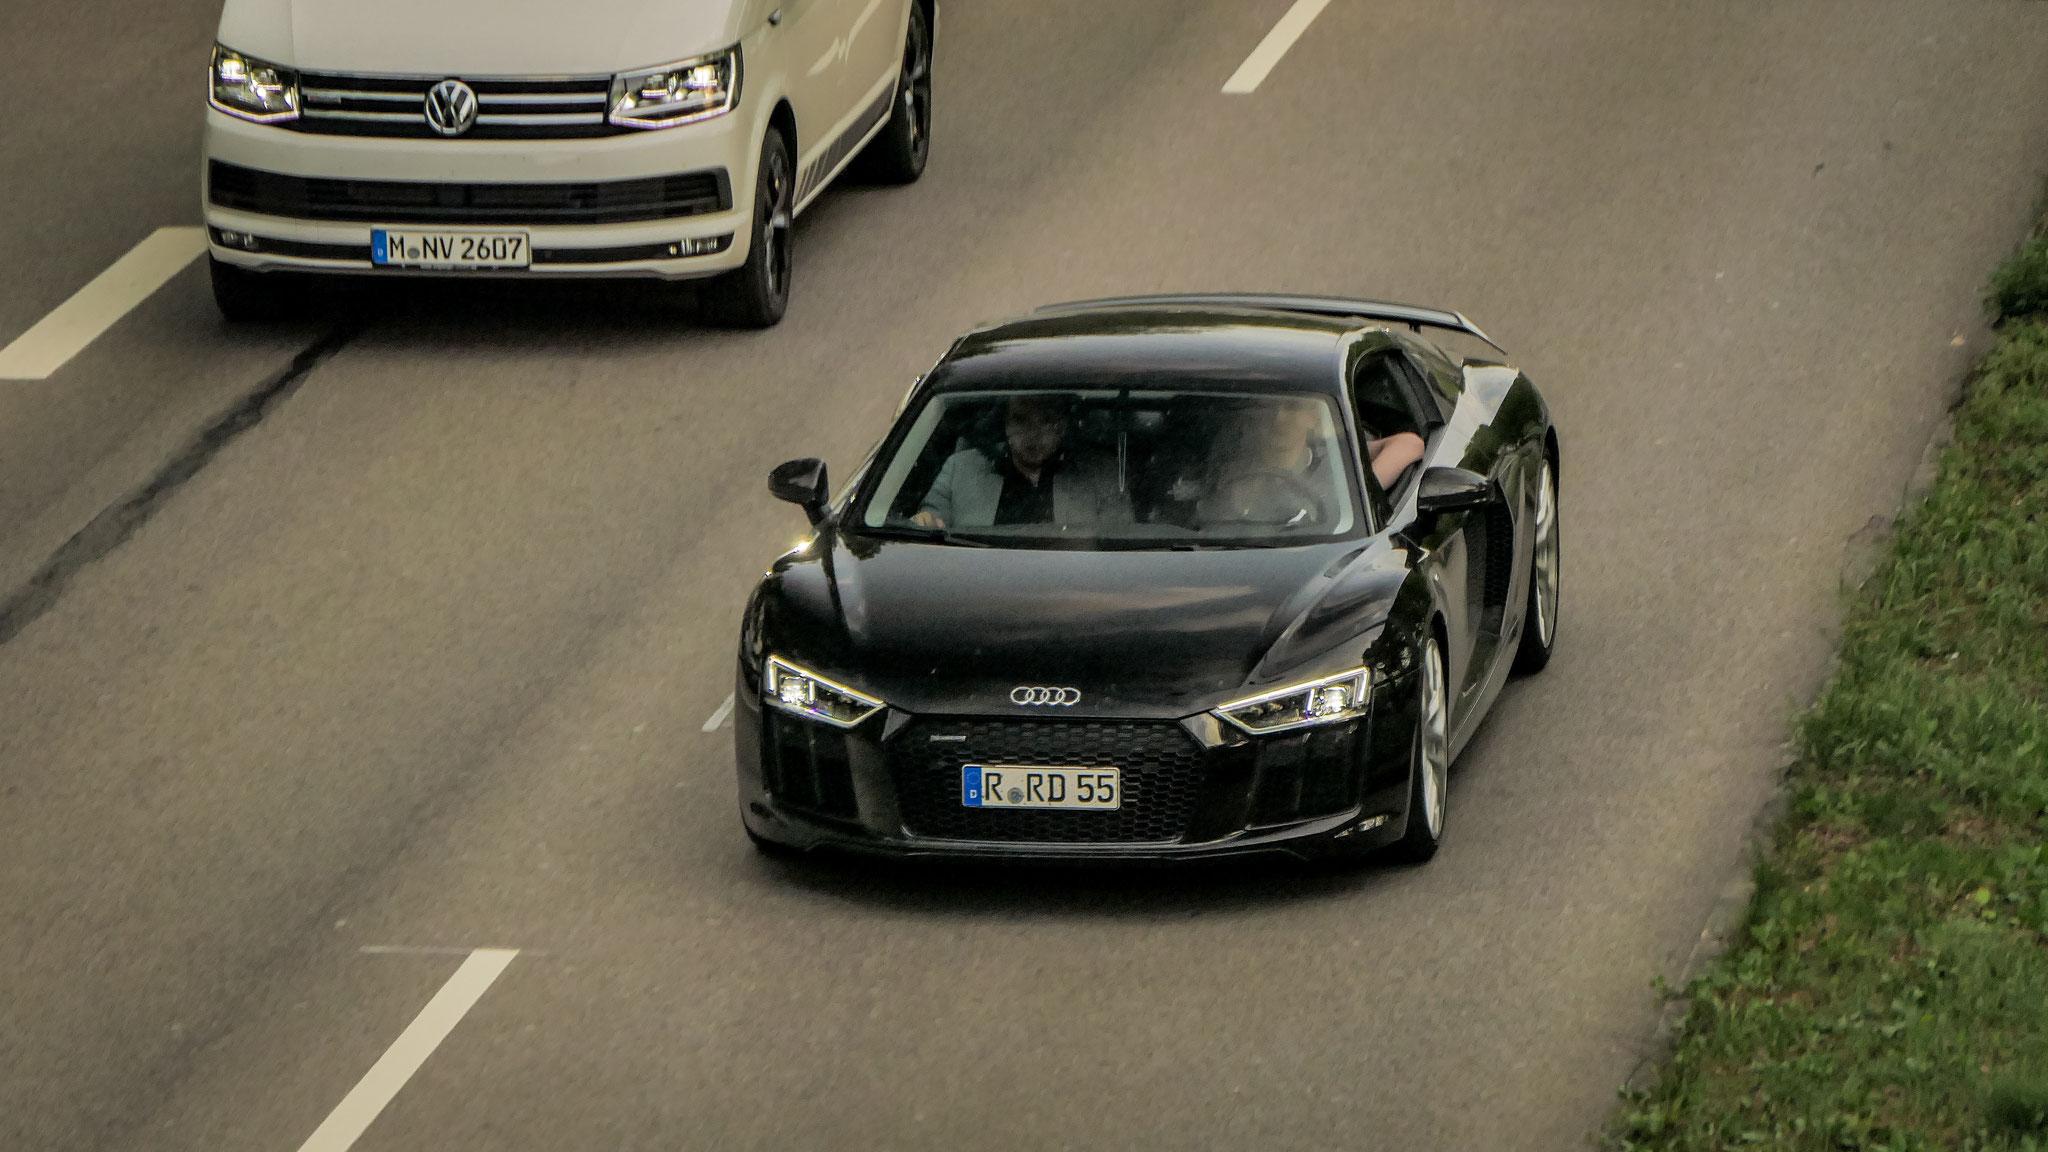 Audi R8 V10 - R-RD-55